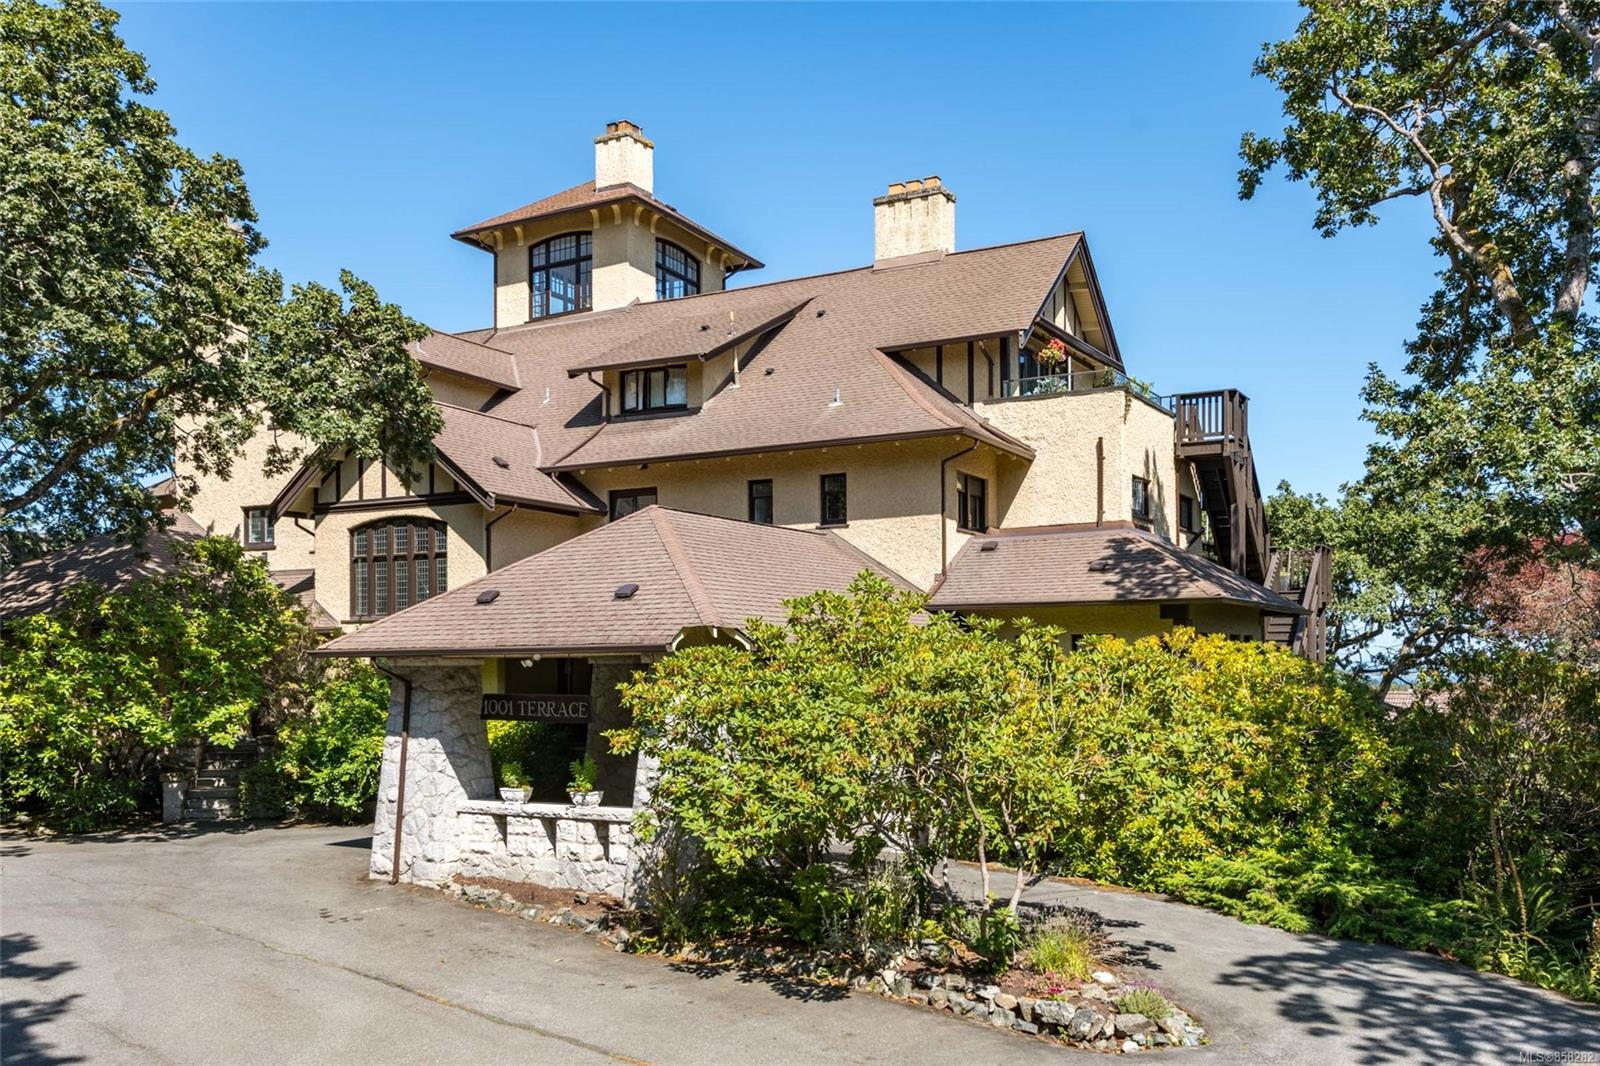 Photo 28 at 2 - 1001 Terrace Avenue, Rockland, Victoria